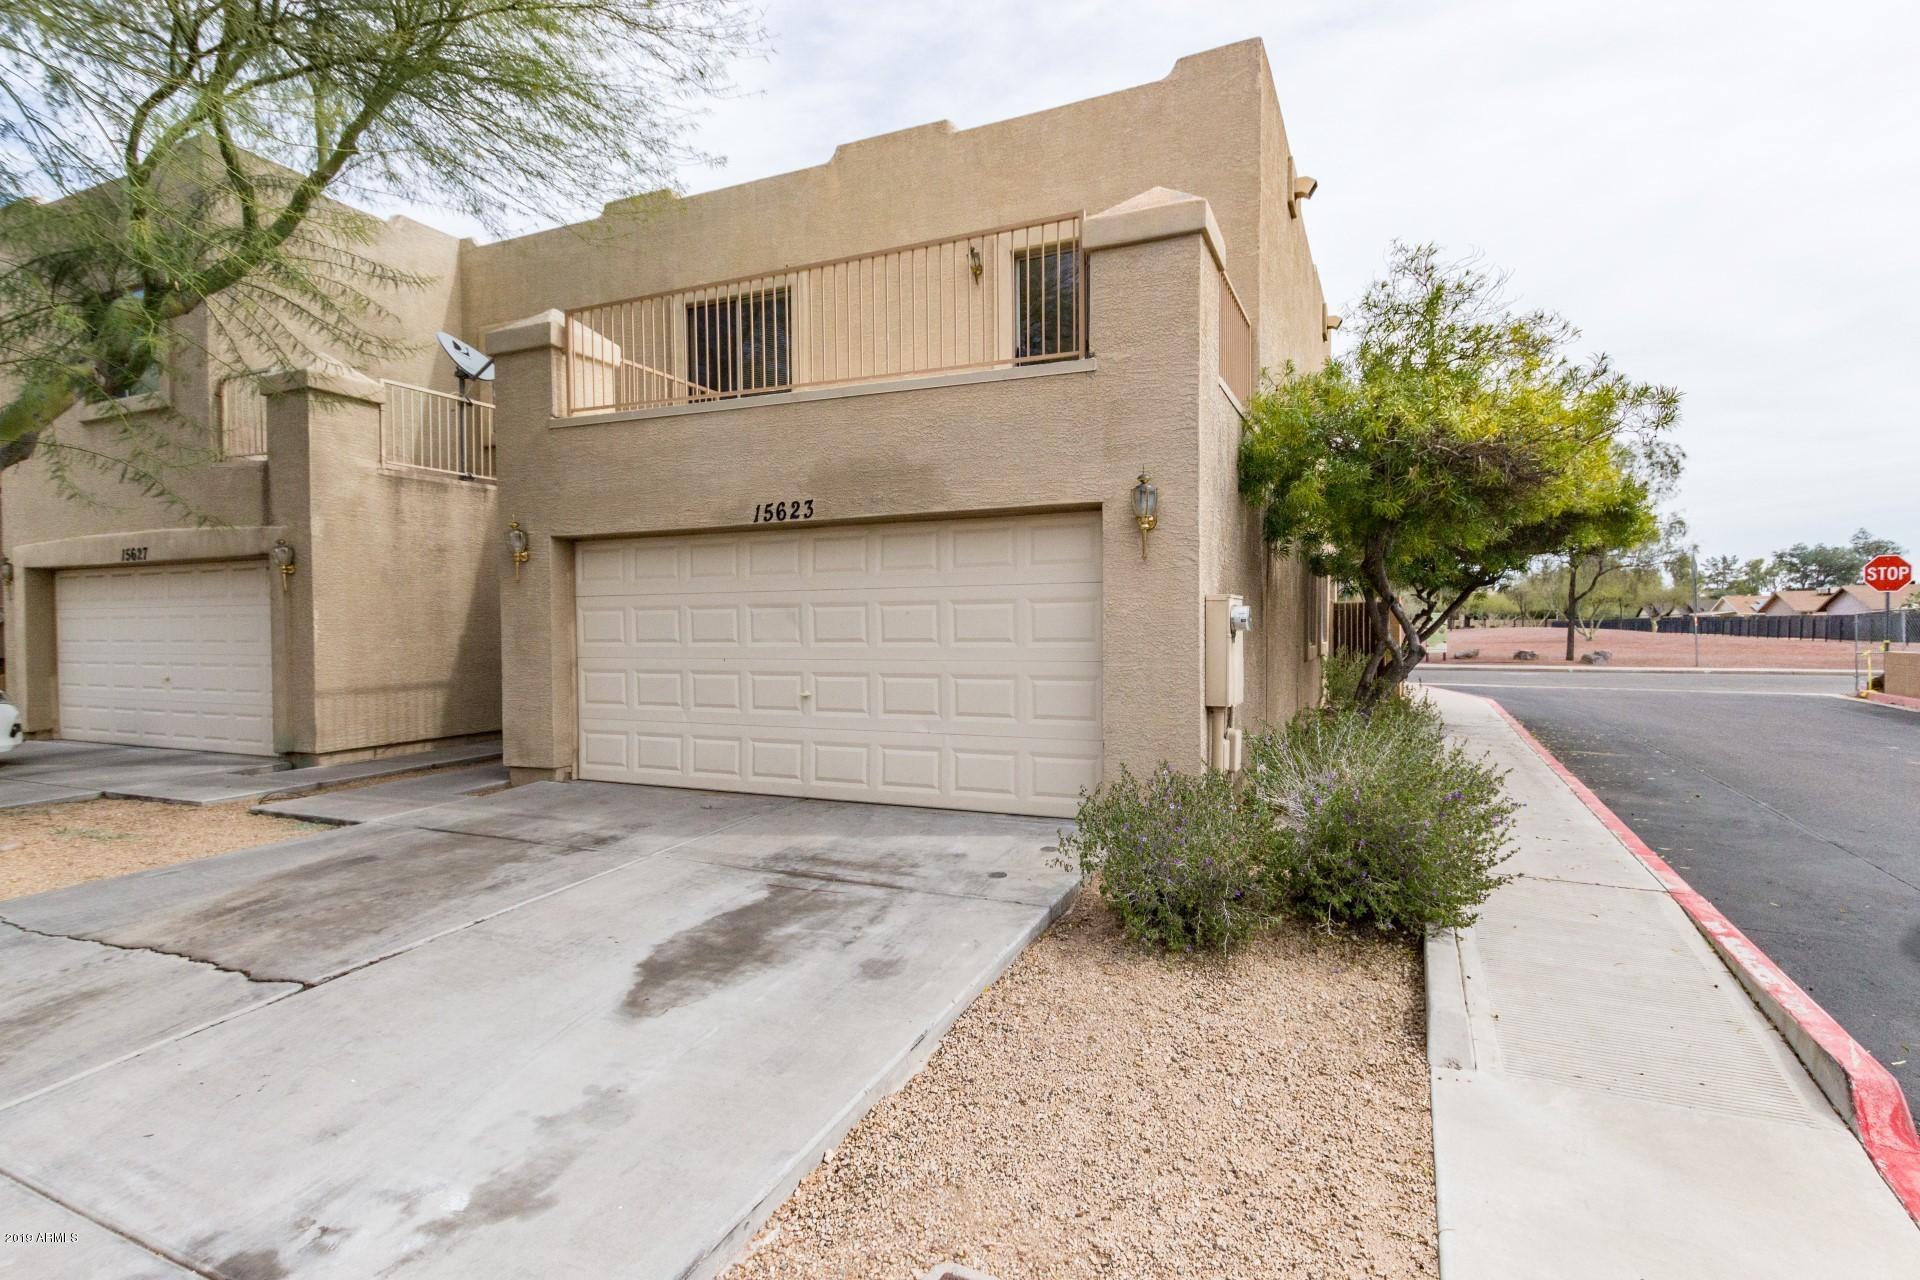 Photo of 15623 N 29TH Way, Phoenix, AZ 85032